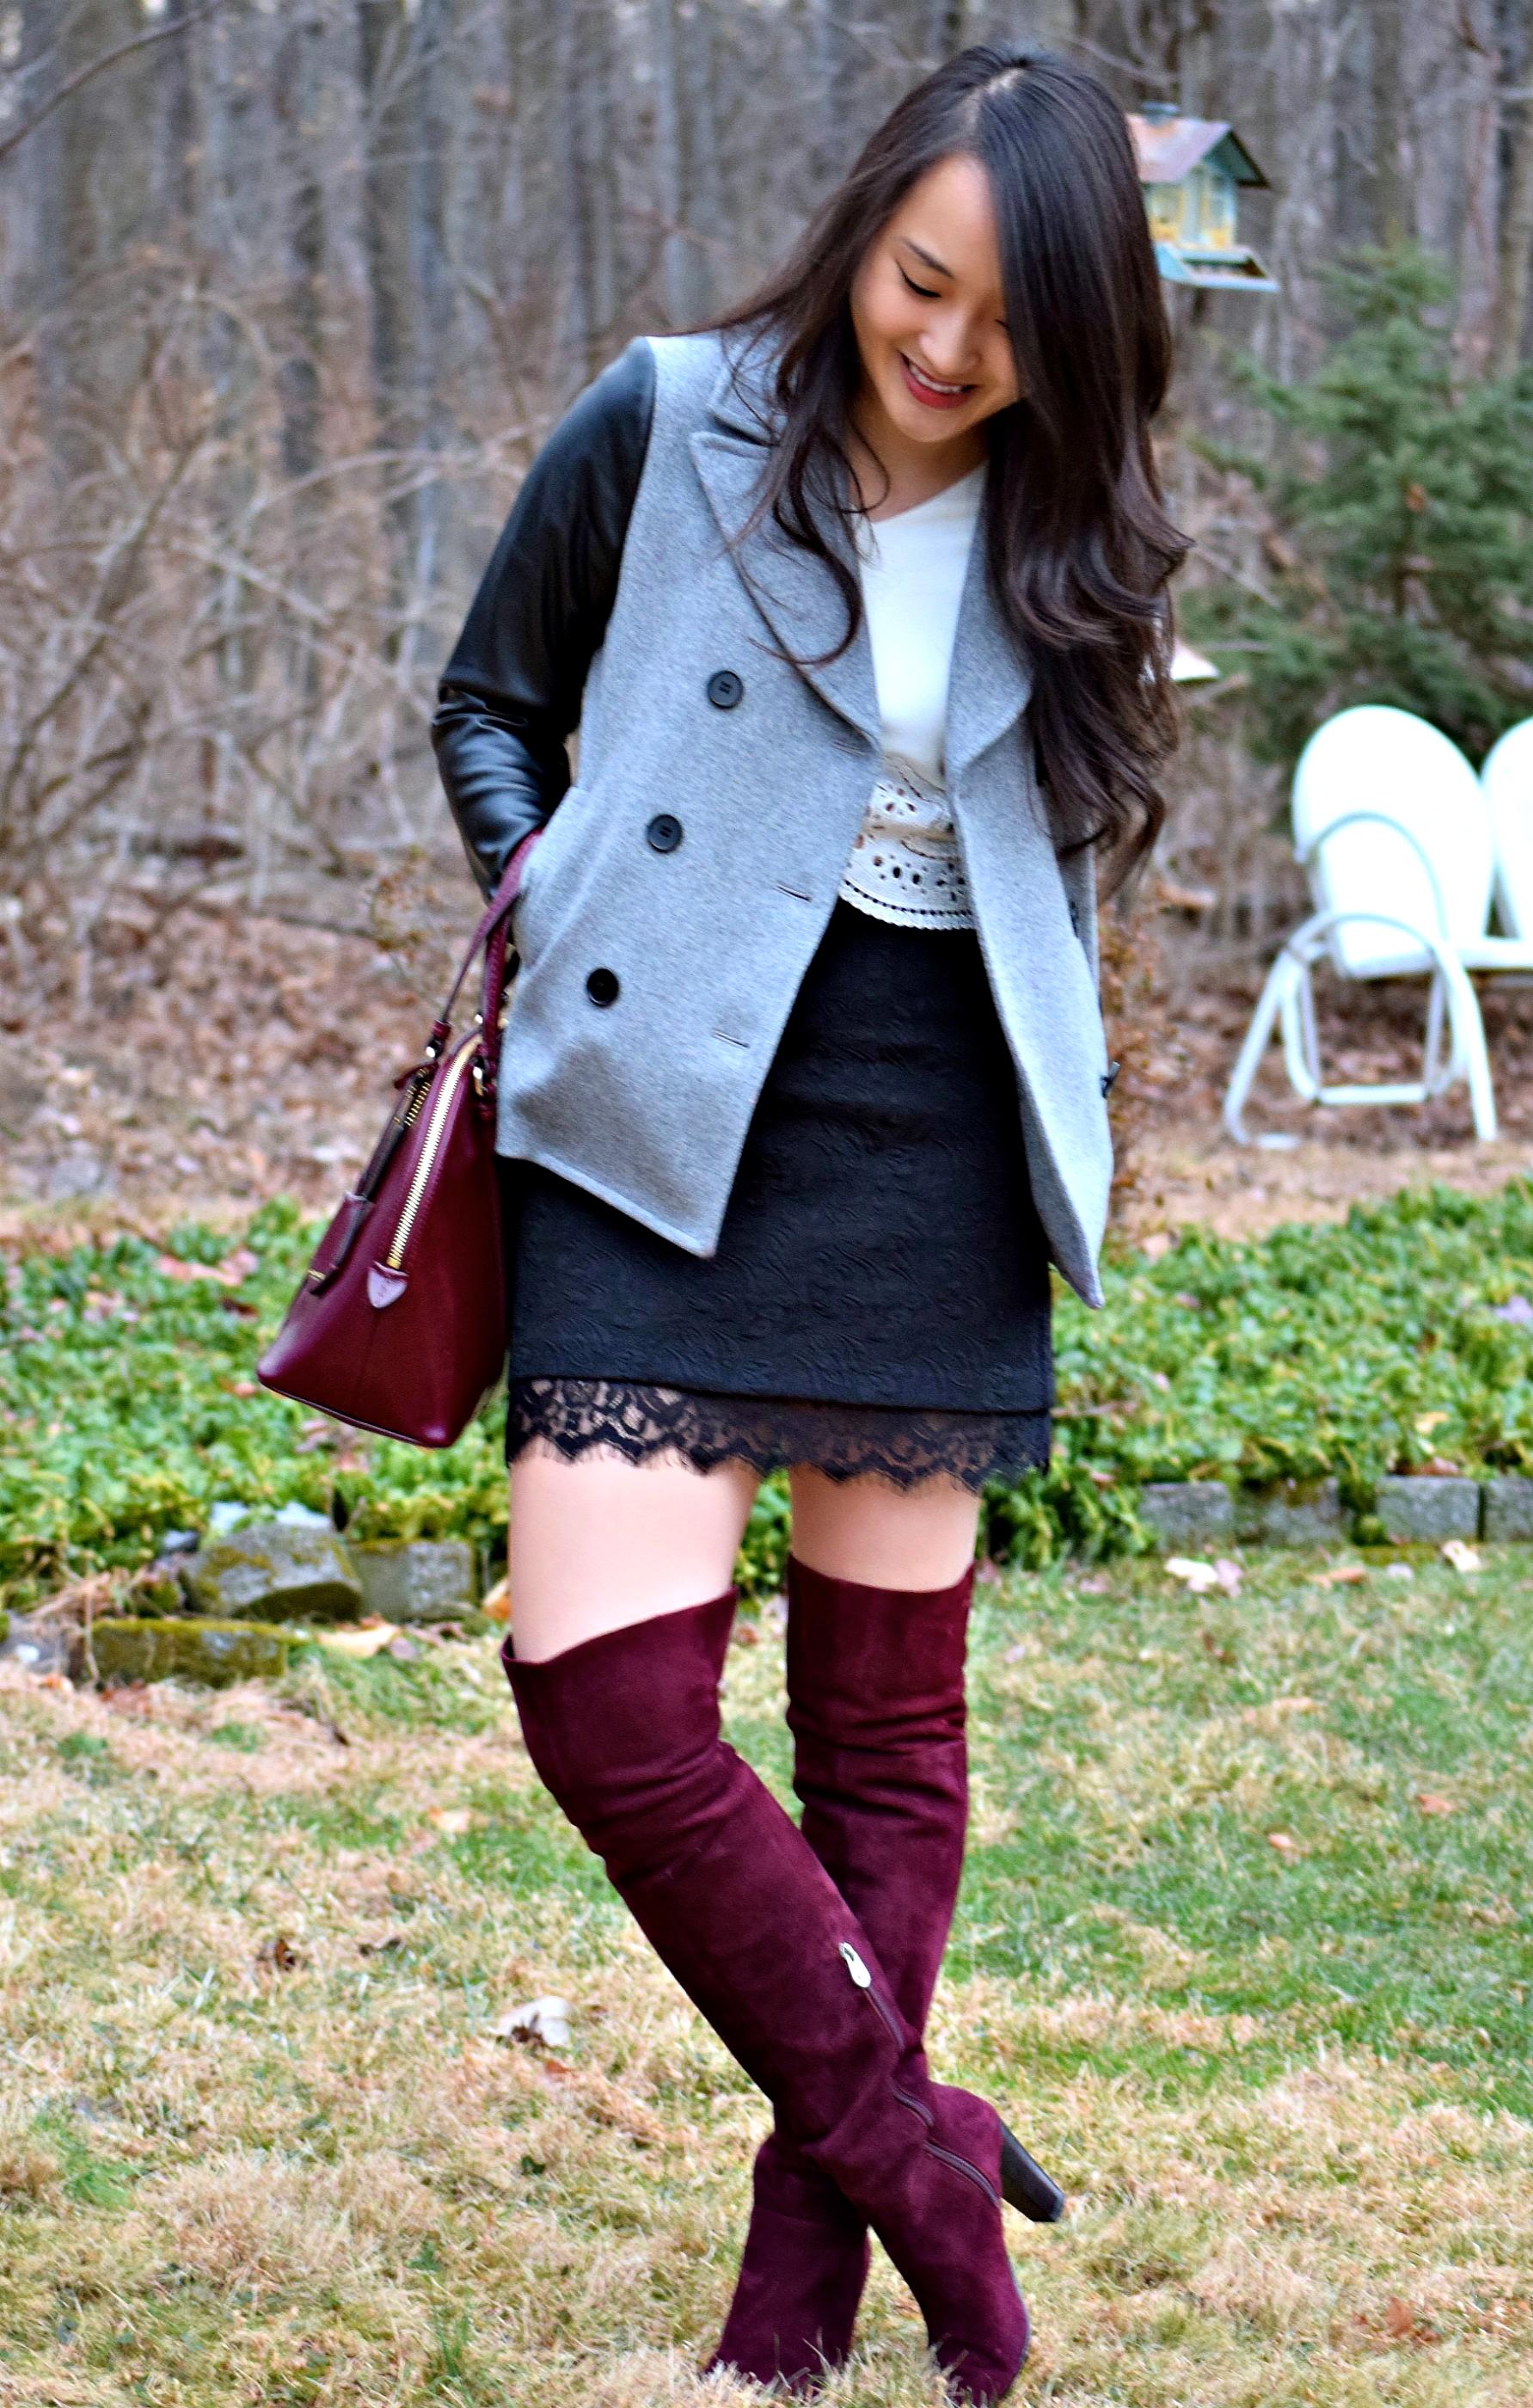 Burgundy Over The Knee Boots Areta S Style Secrets